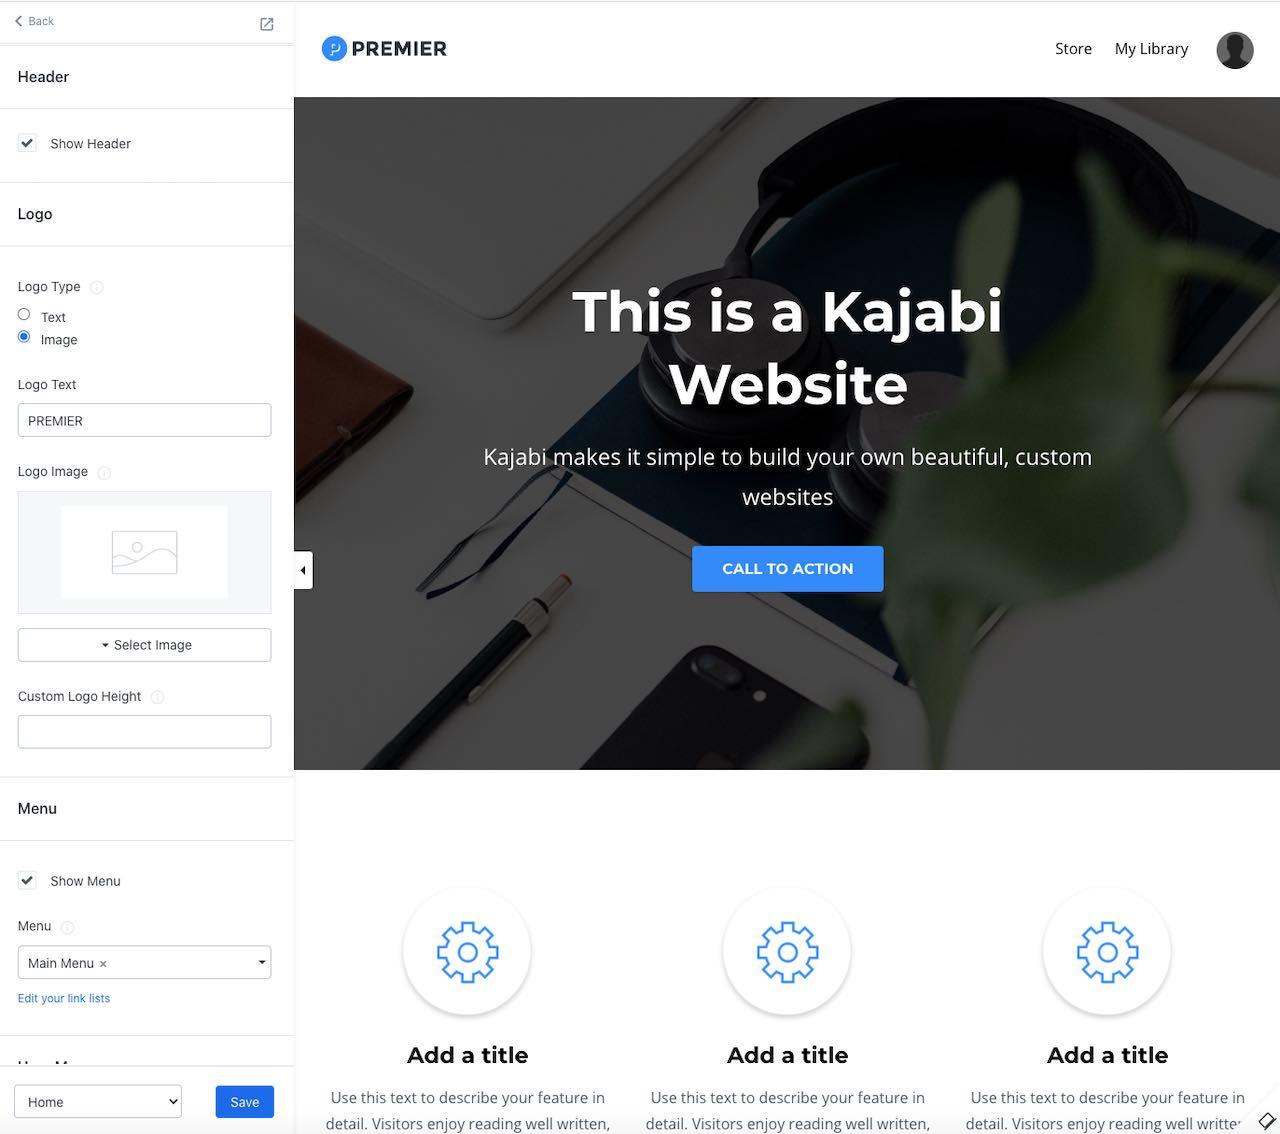 Building a website in the Kajabi platform